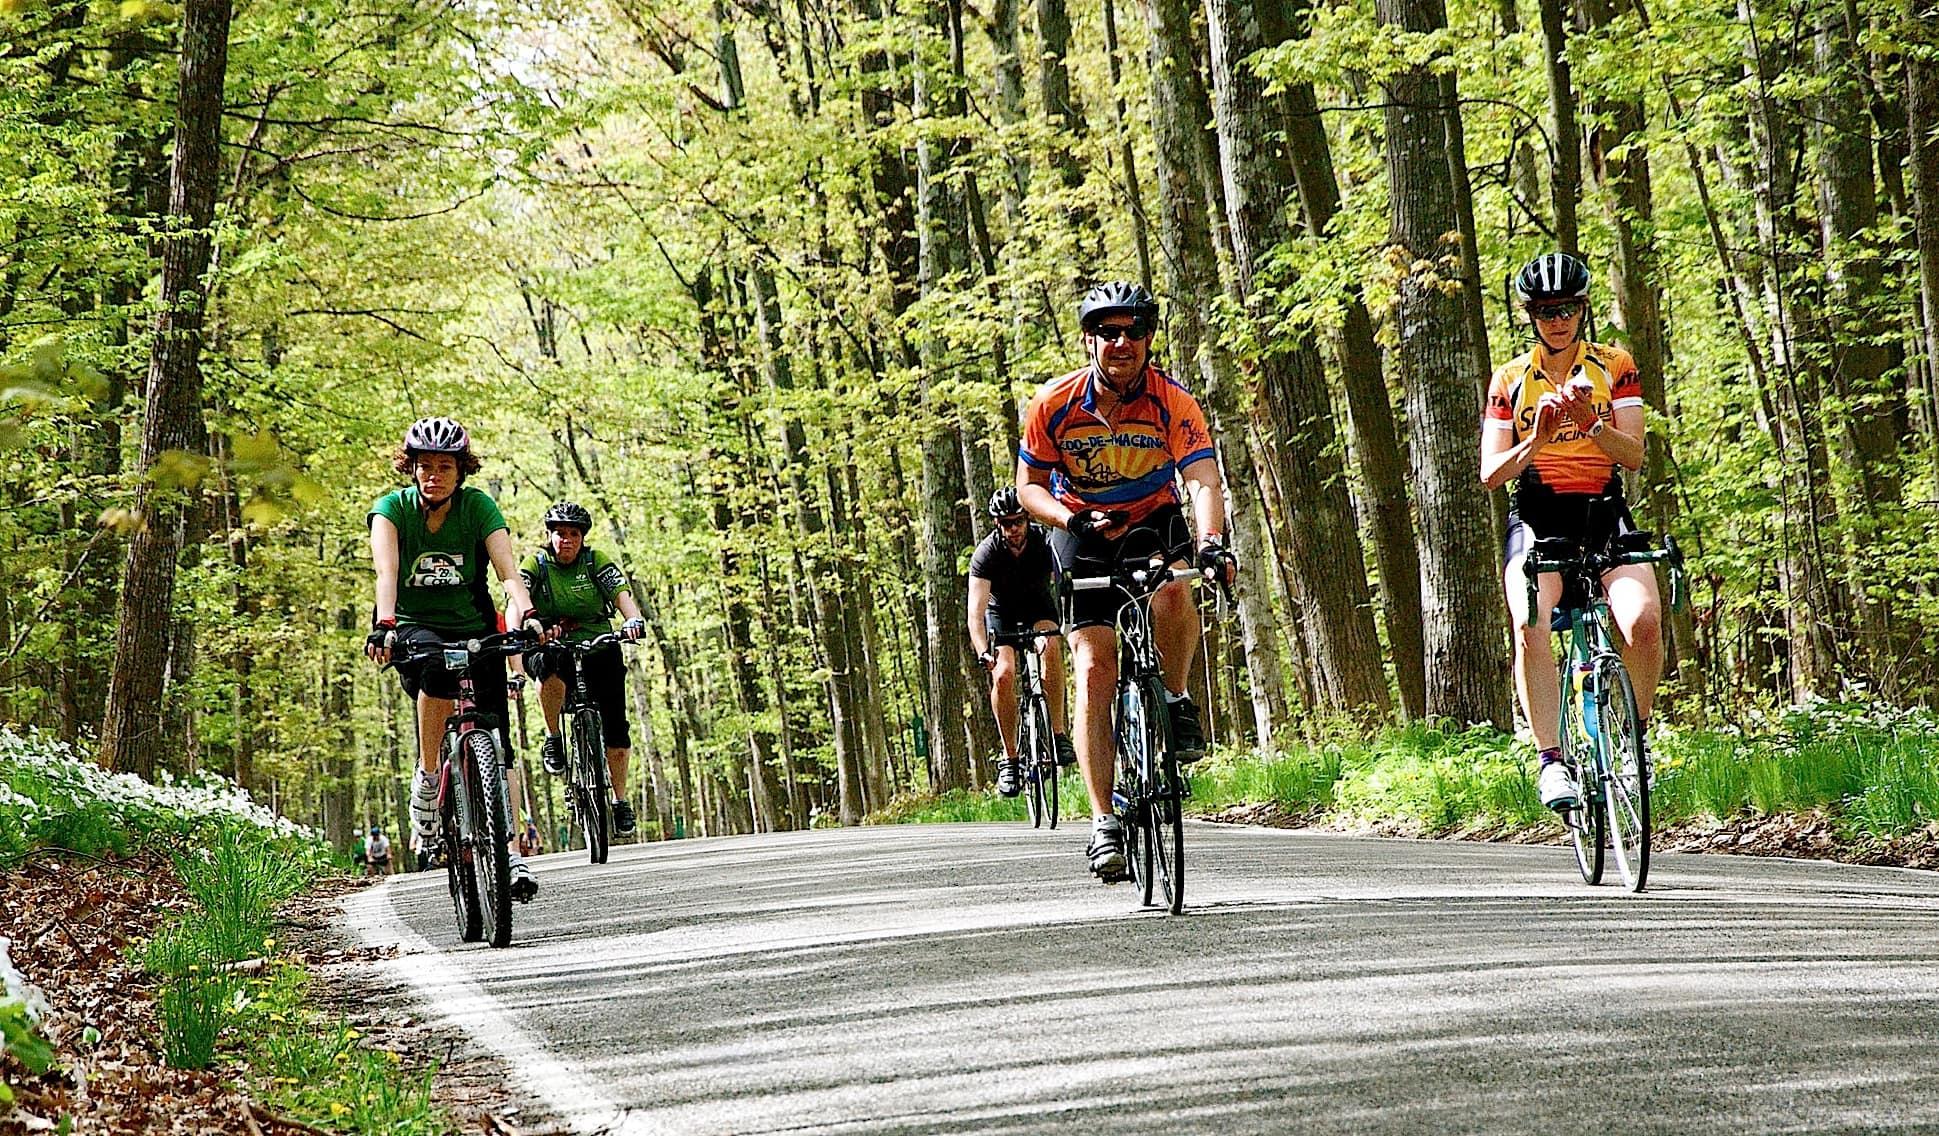 Boyne City Mi >> Boyne's Zoo de Mac Bike Ride from Harbor Springs to Mackinaw